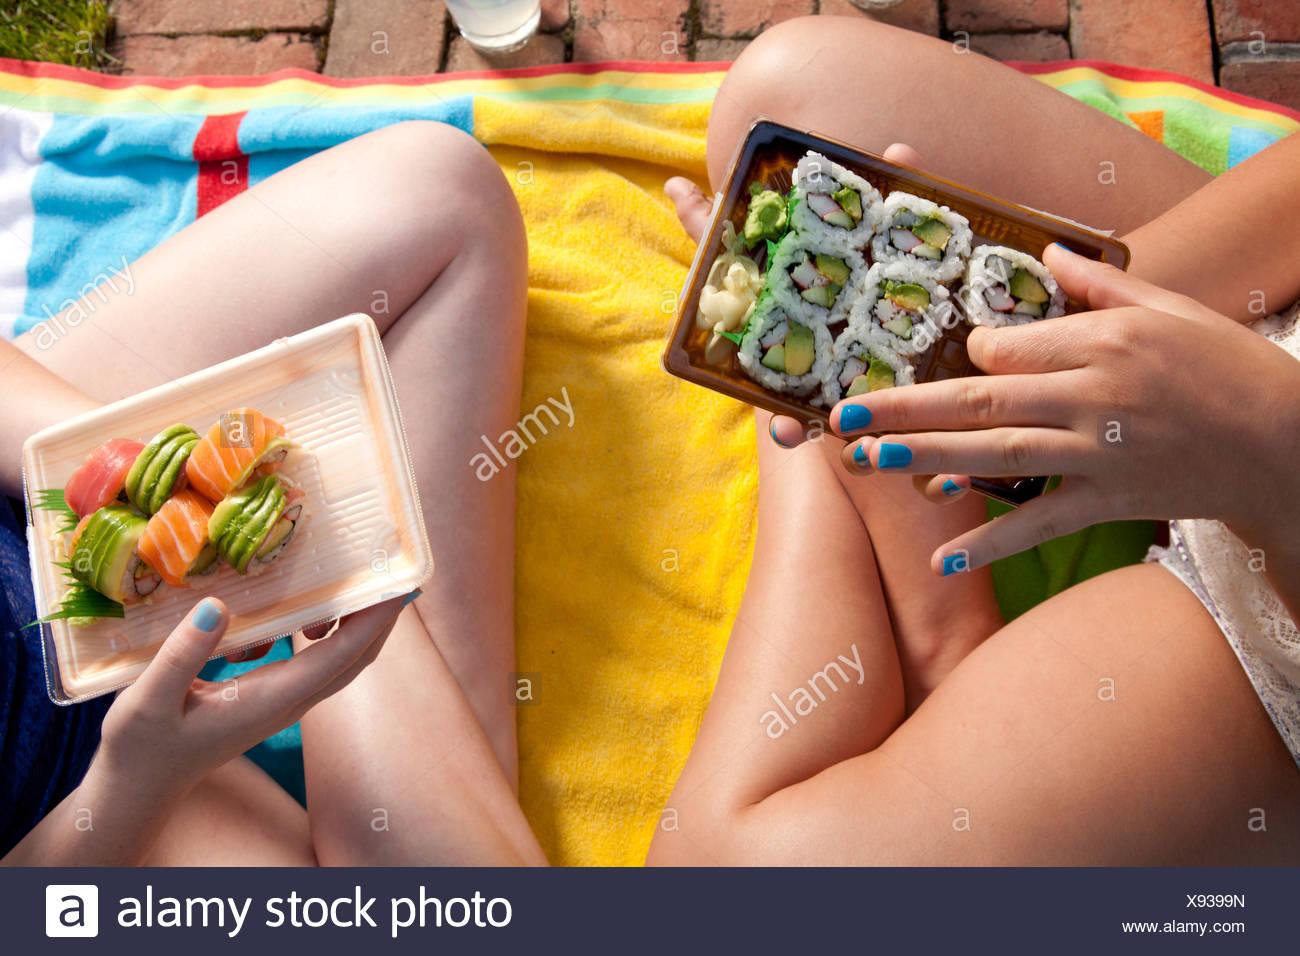 Friends eating sushi - Stock Image